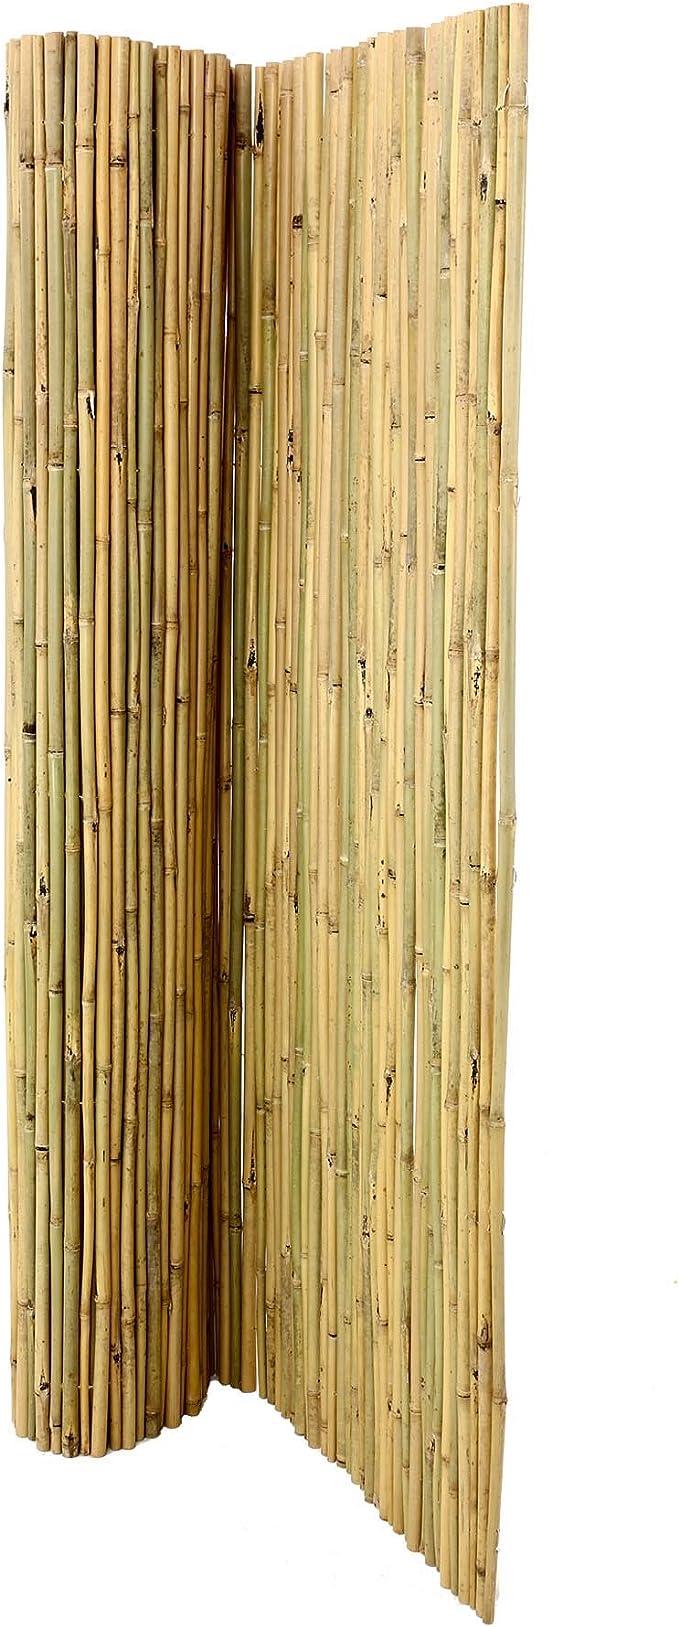 Bambus Matte Bali Extrem Stabil 200 X 300 Cm Mit Draht